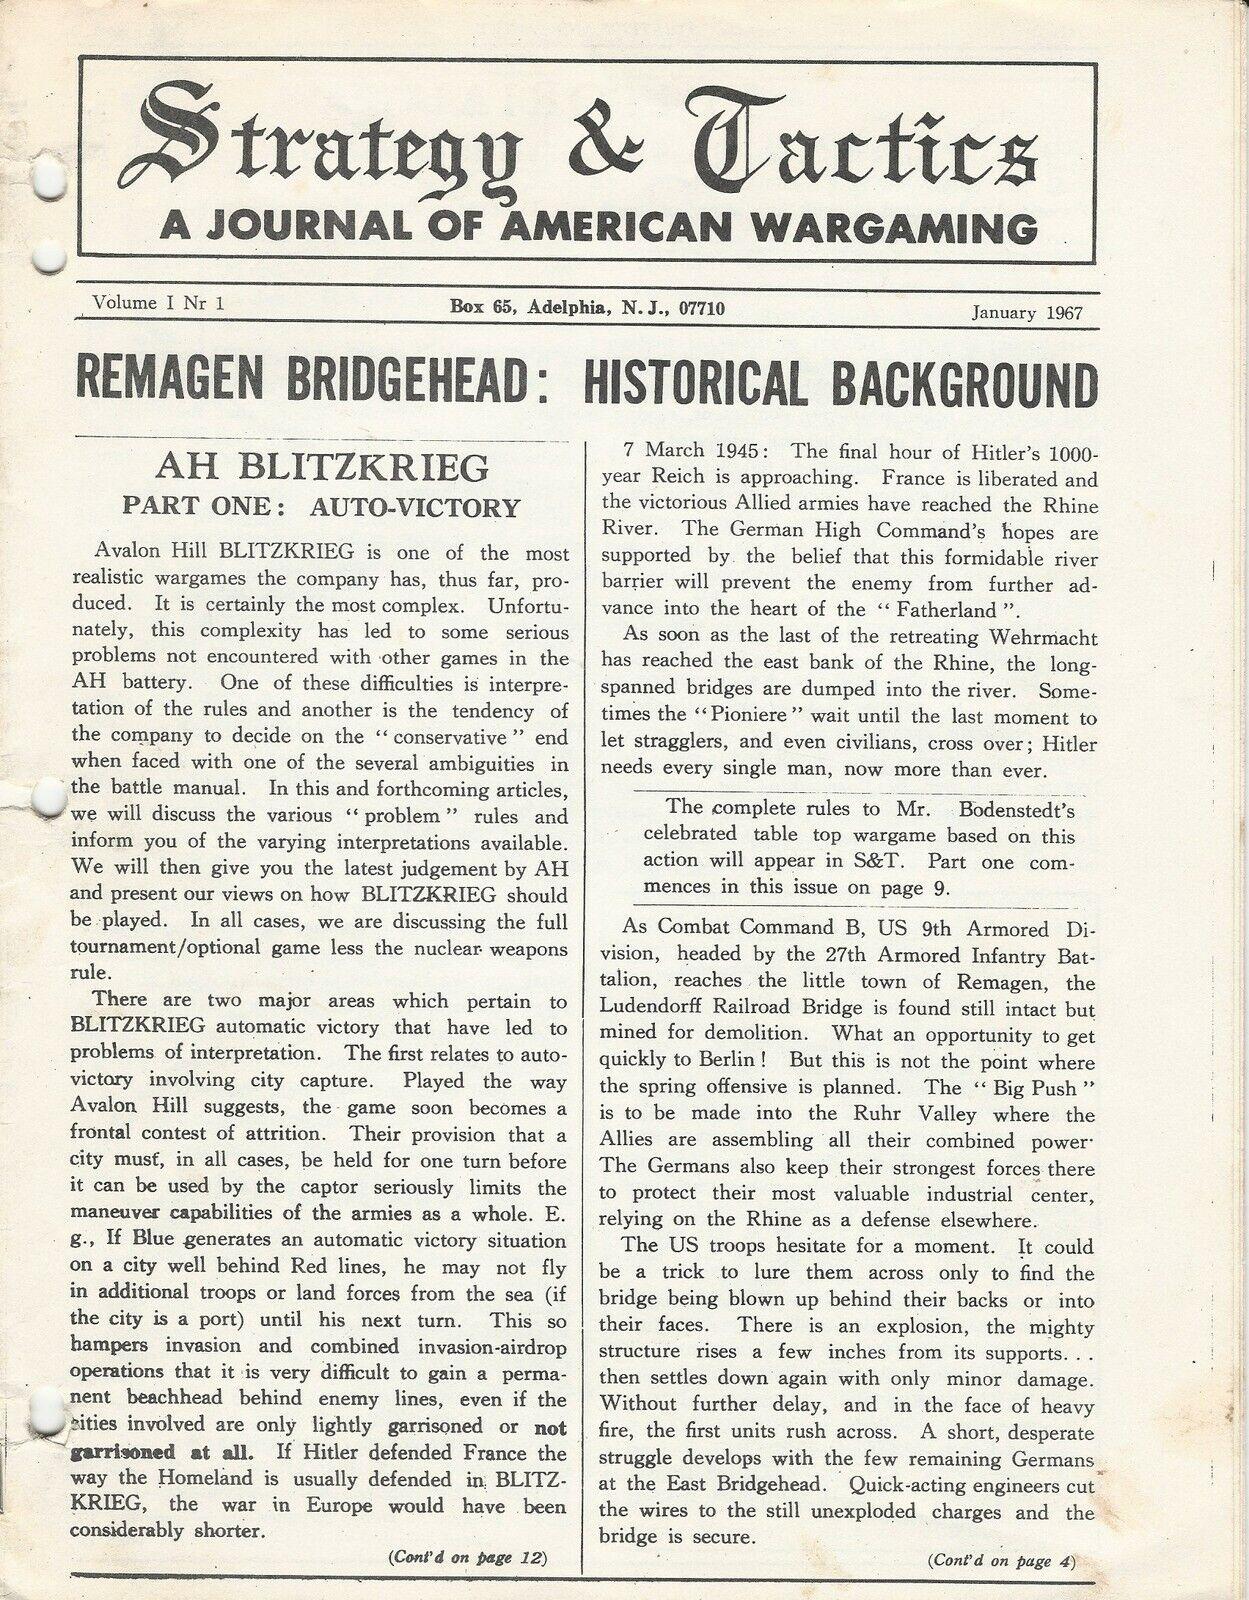 Strategy & Tactics S&T Vol 1 Remagen, Blitzkrieg, First issue reprint FS